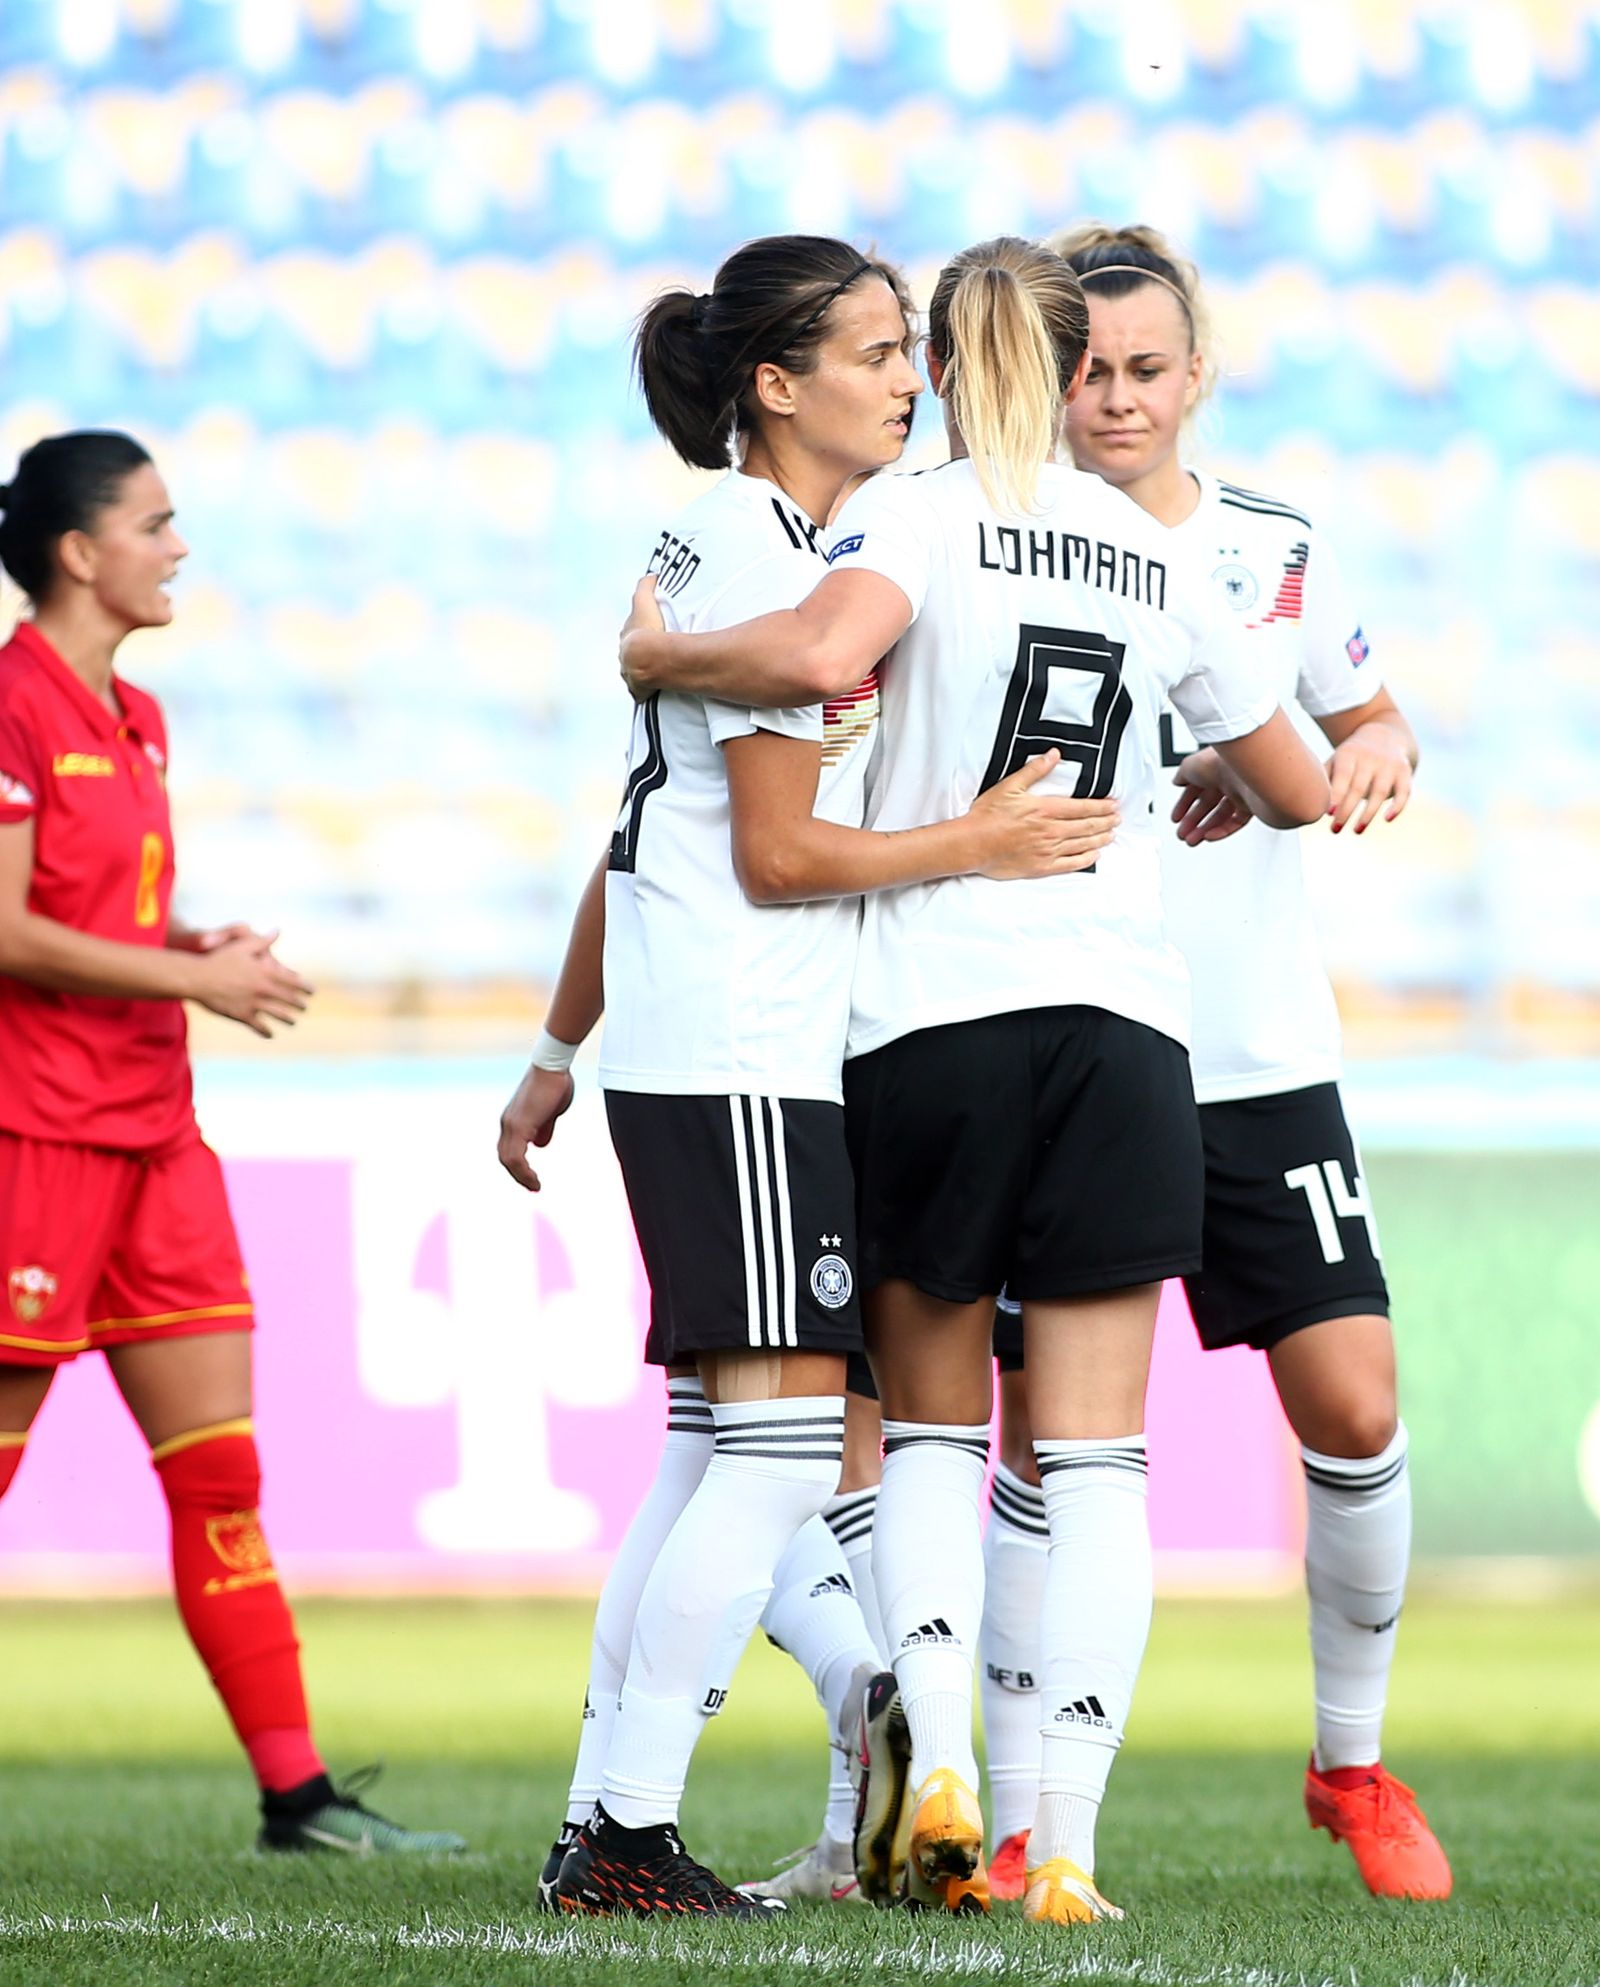 Montenegro Women's v Germany - Womens's UEFA Women's EURO 2022 Qualifier